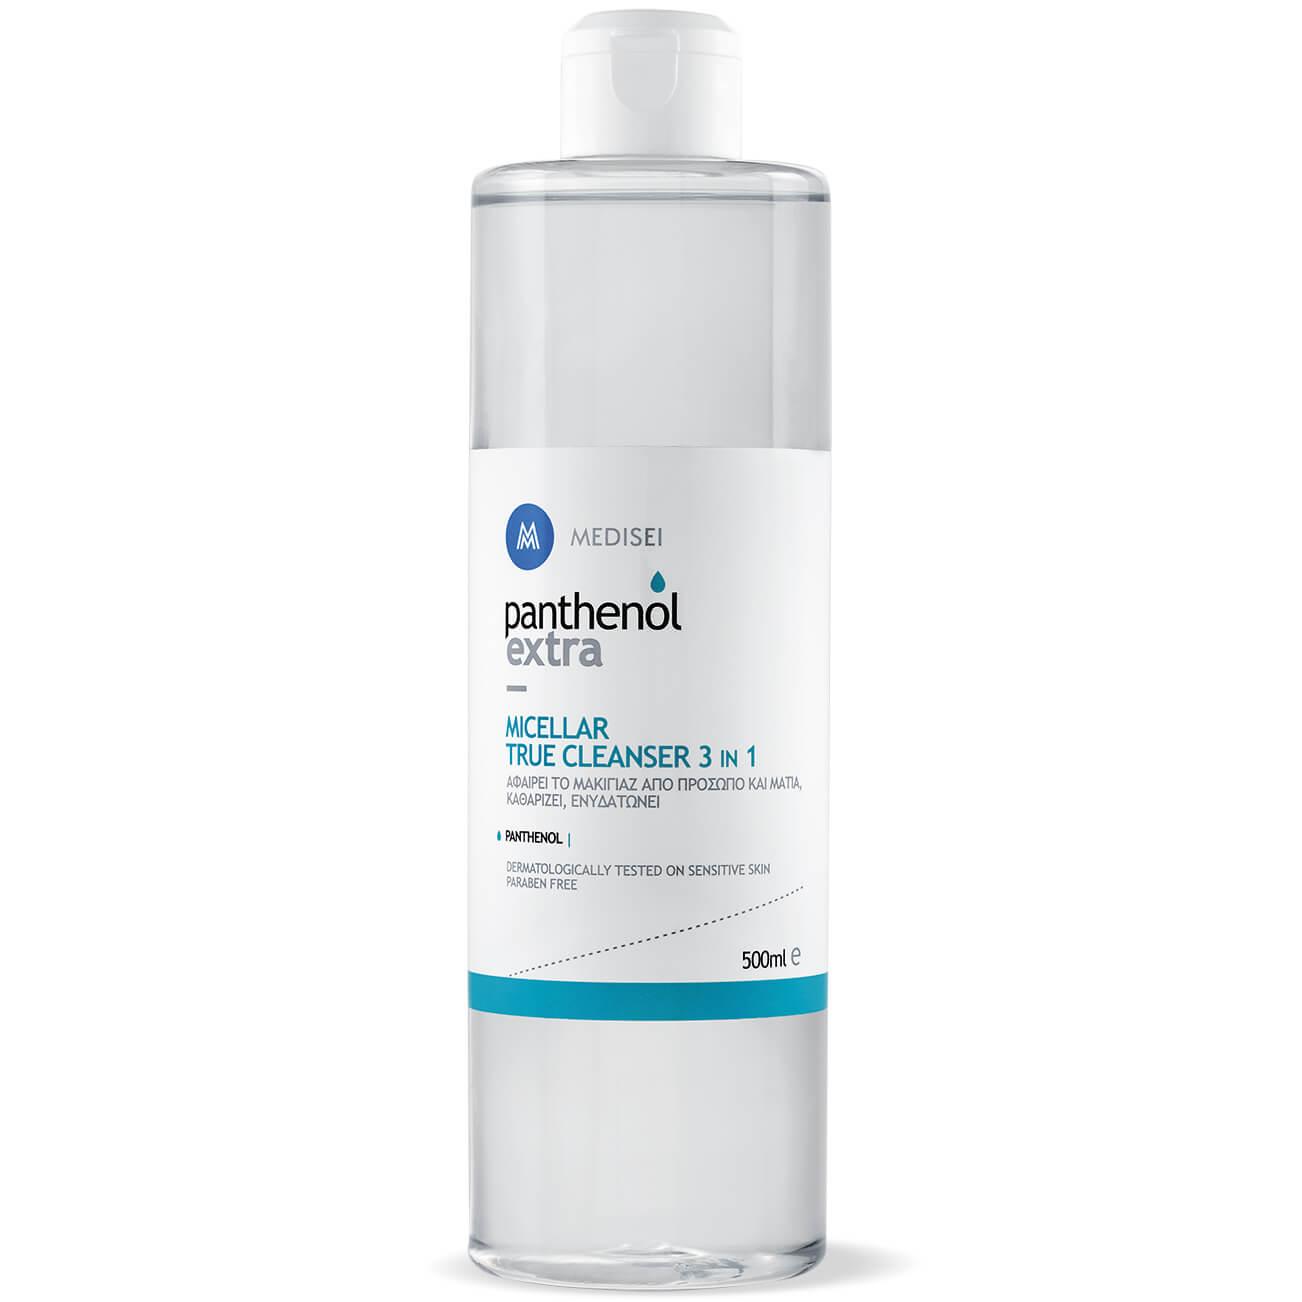 Medisei Panthenol Extra Micellar True Cleanser 3 in 1 Νερό Micellar για τον Καθα ομορφιά   καθαρισμός προσώπου   απαλό νερό καθαρισμού